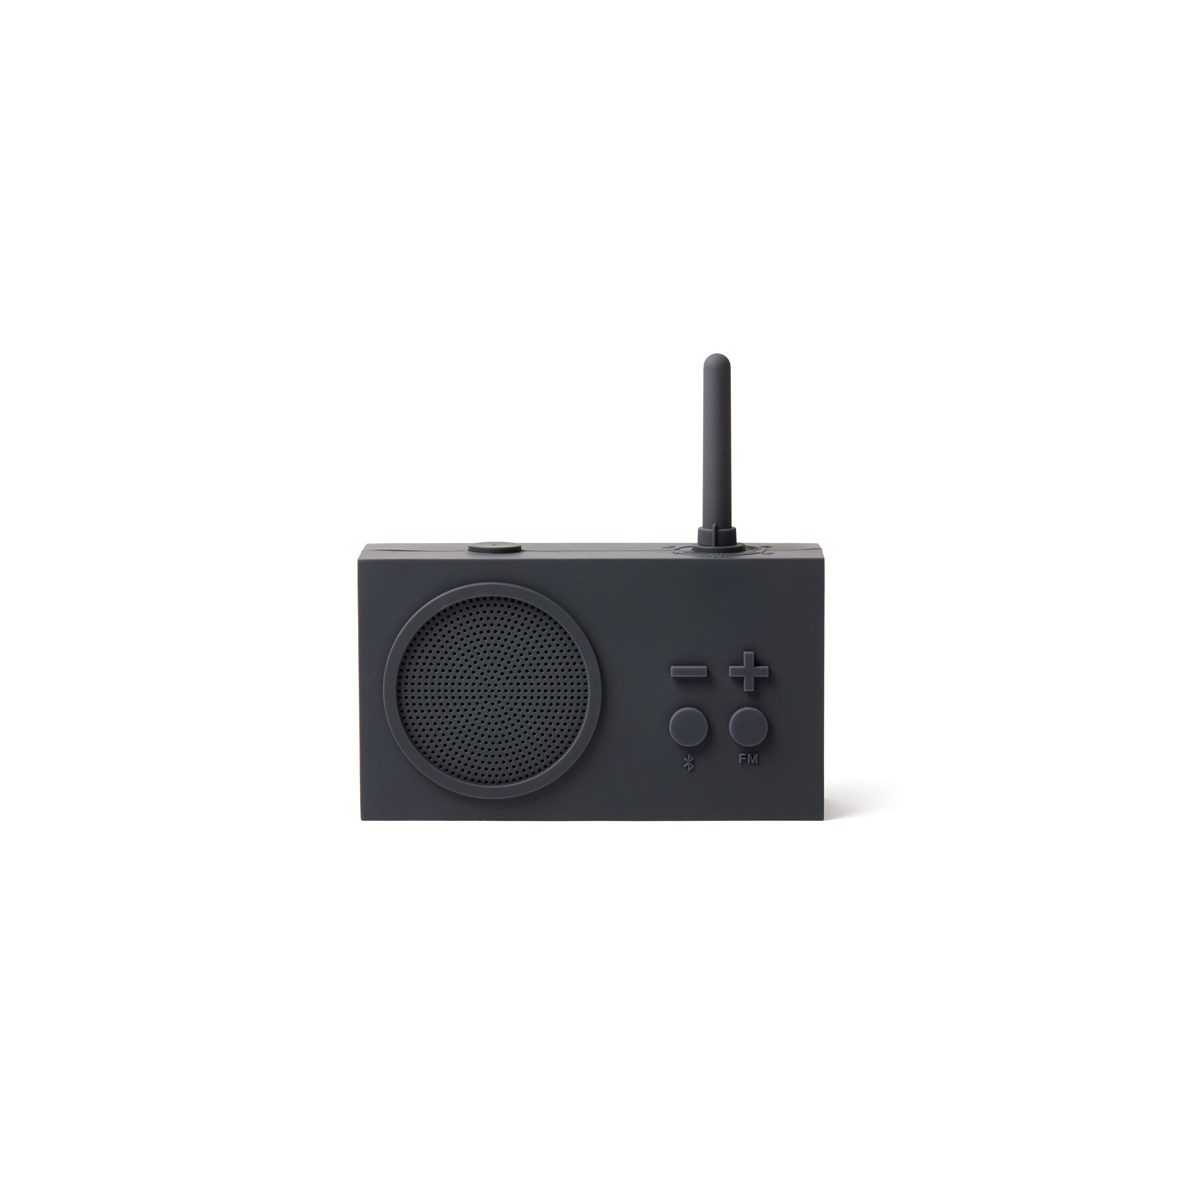 Enceinte Bluetooth et Radio en Gomme Gris anthracite